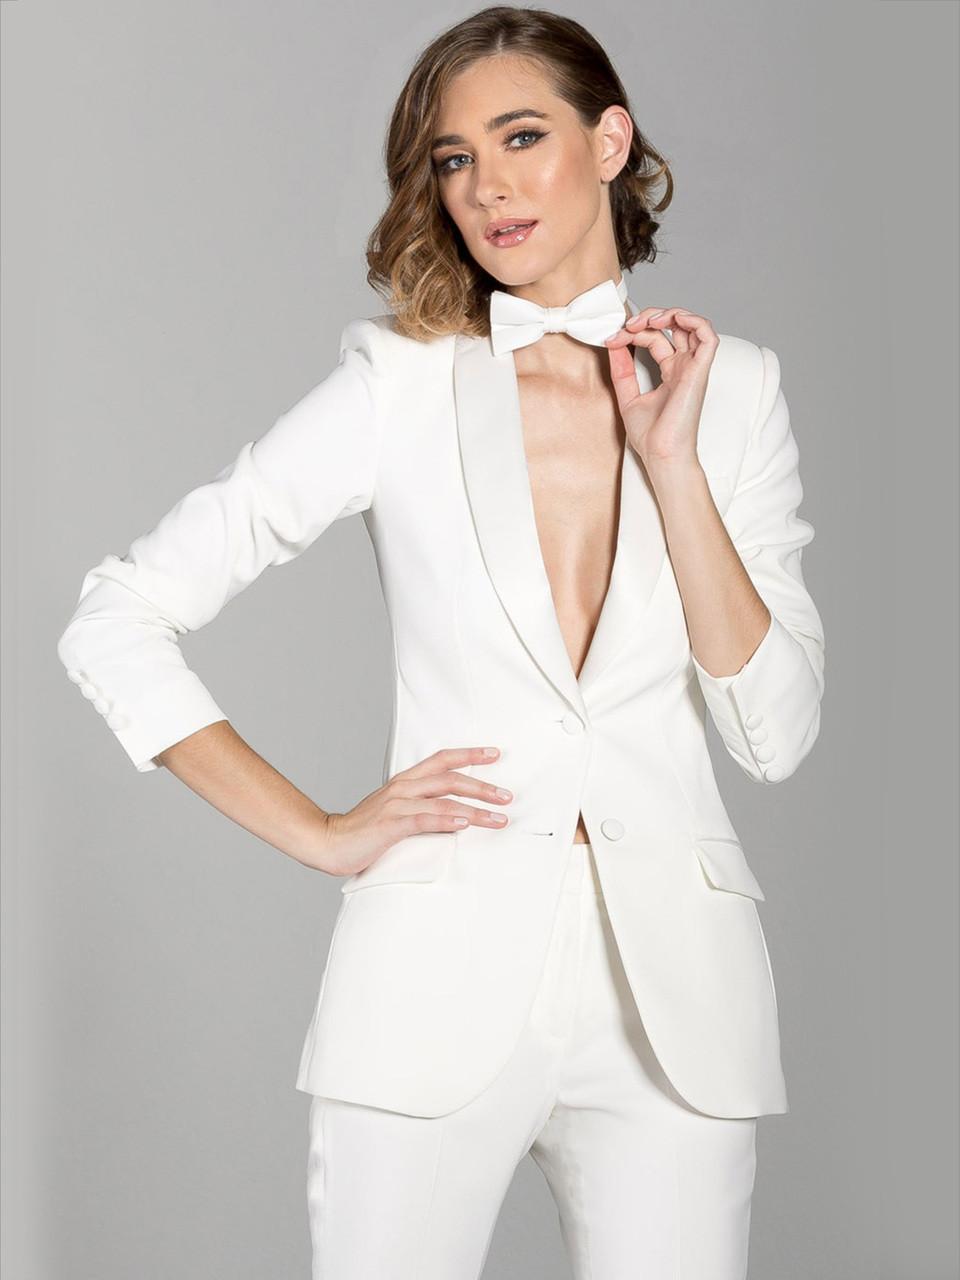 Diamond White women tux suit jacket long length with shawl collar lapel e893e1a5e